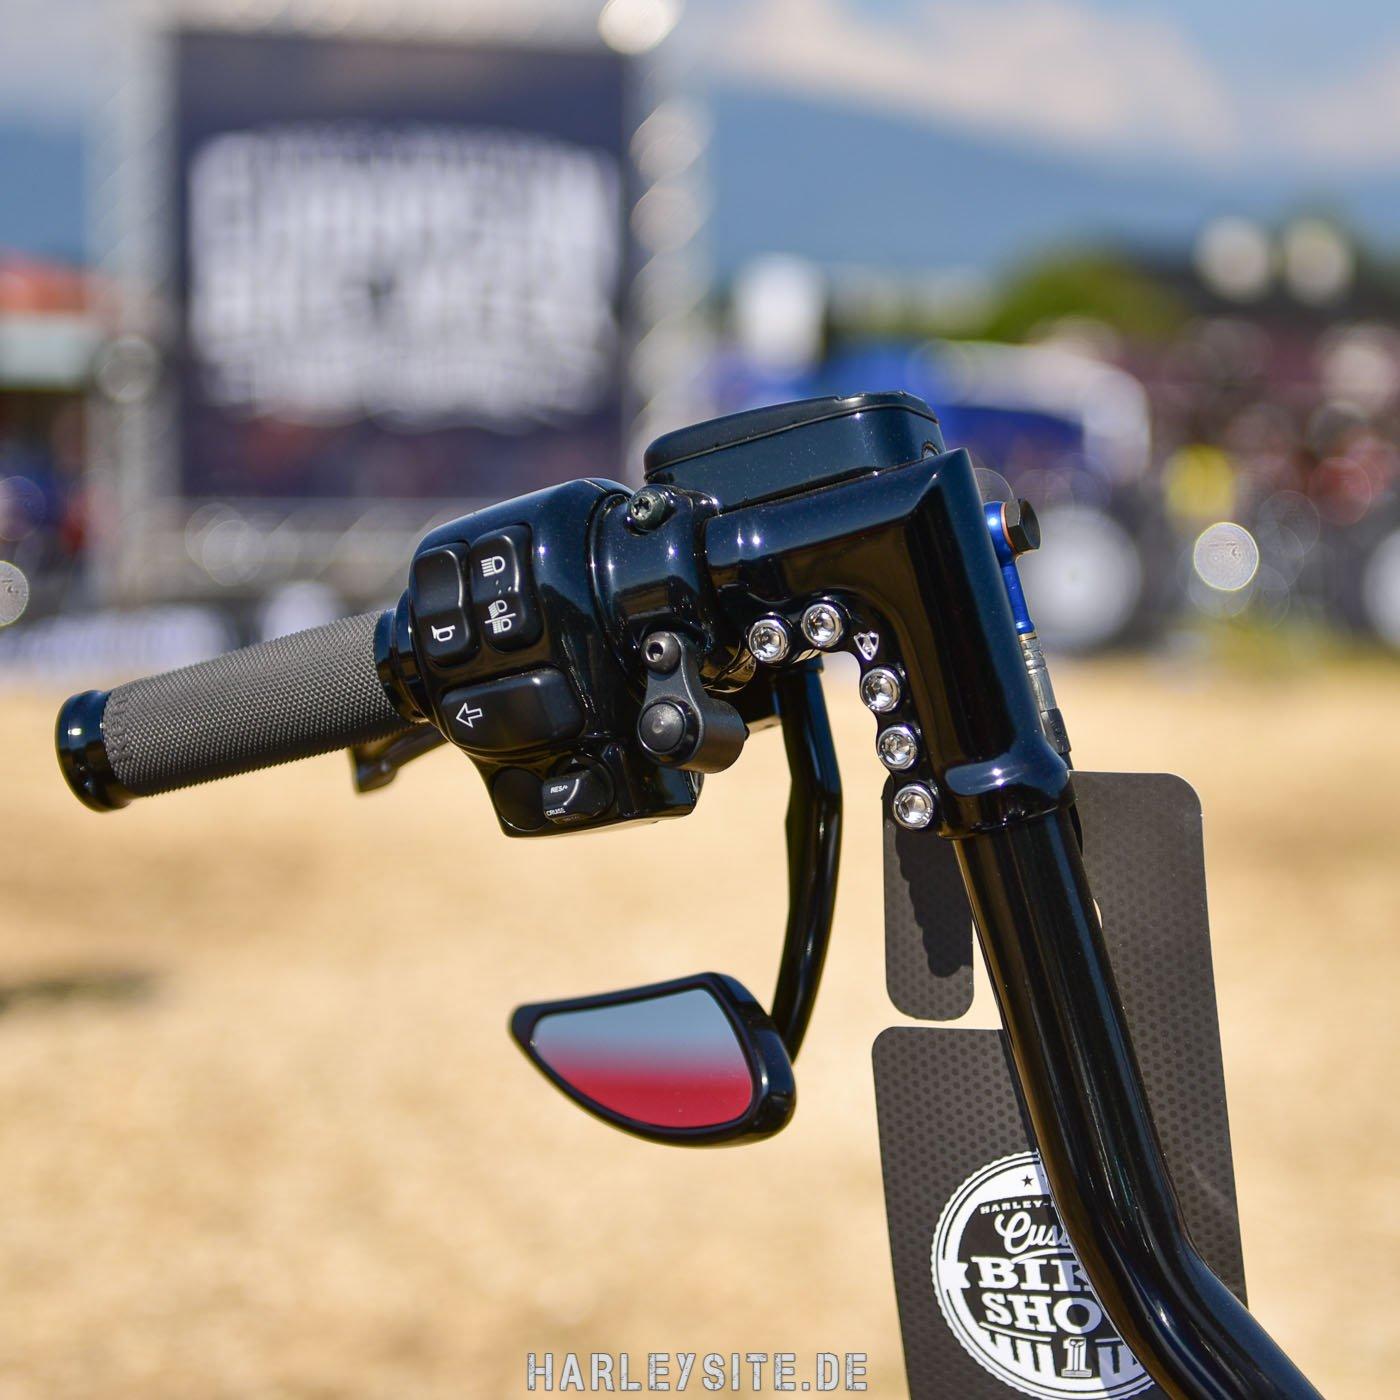 European-Bike-Week-30